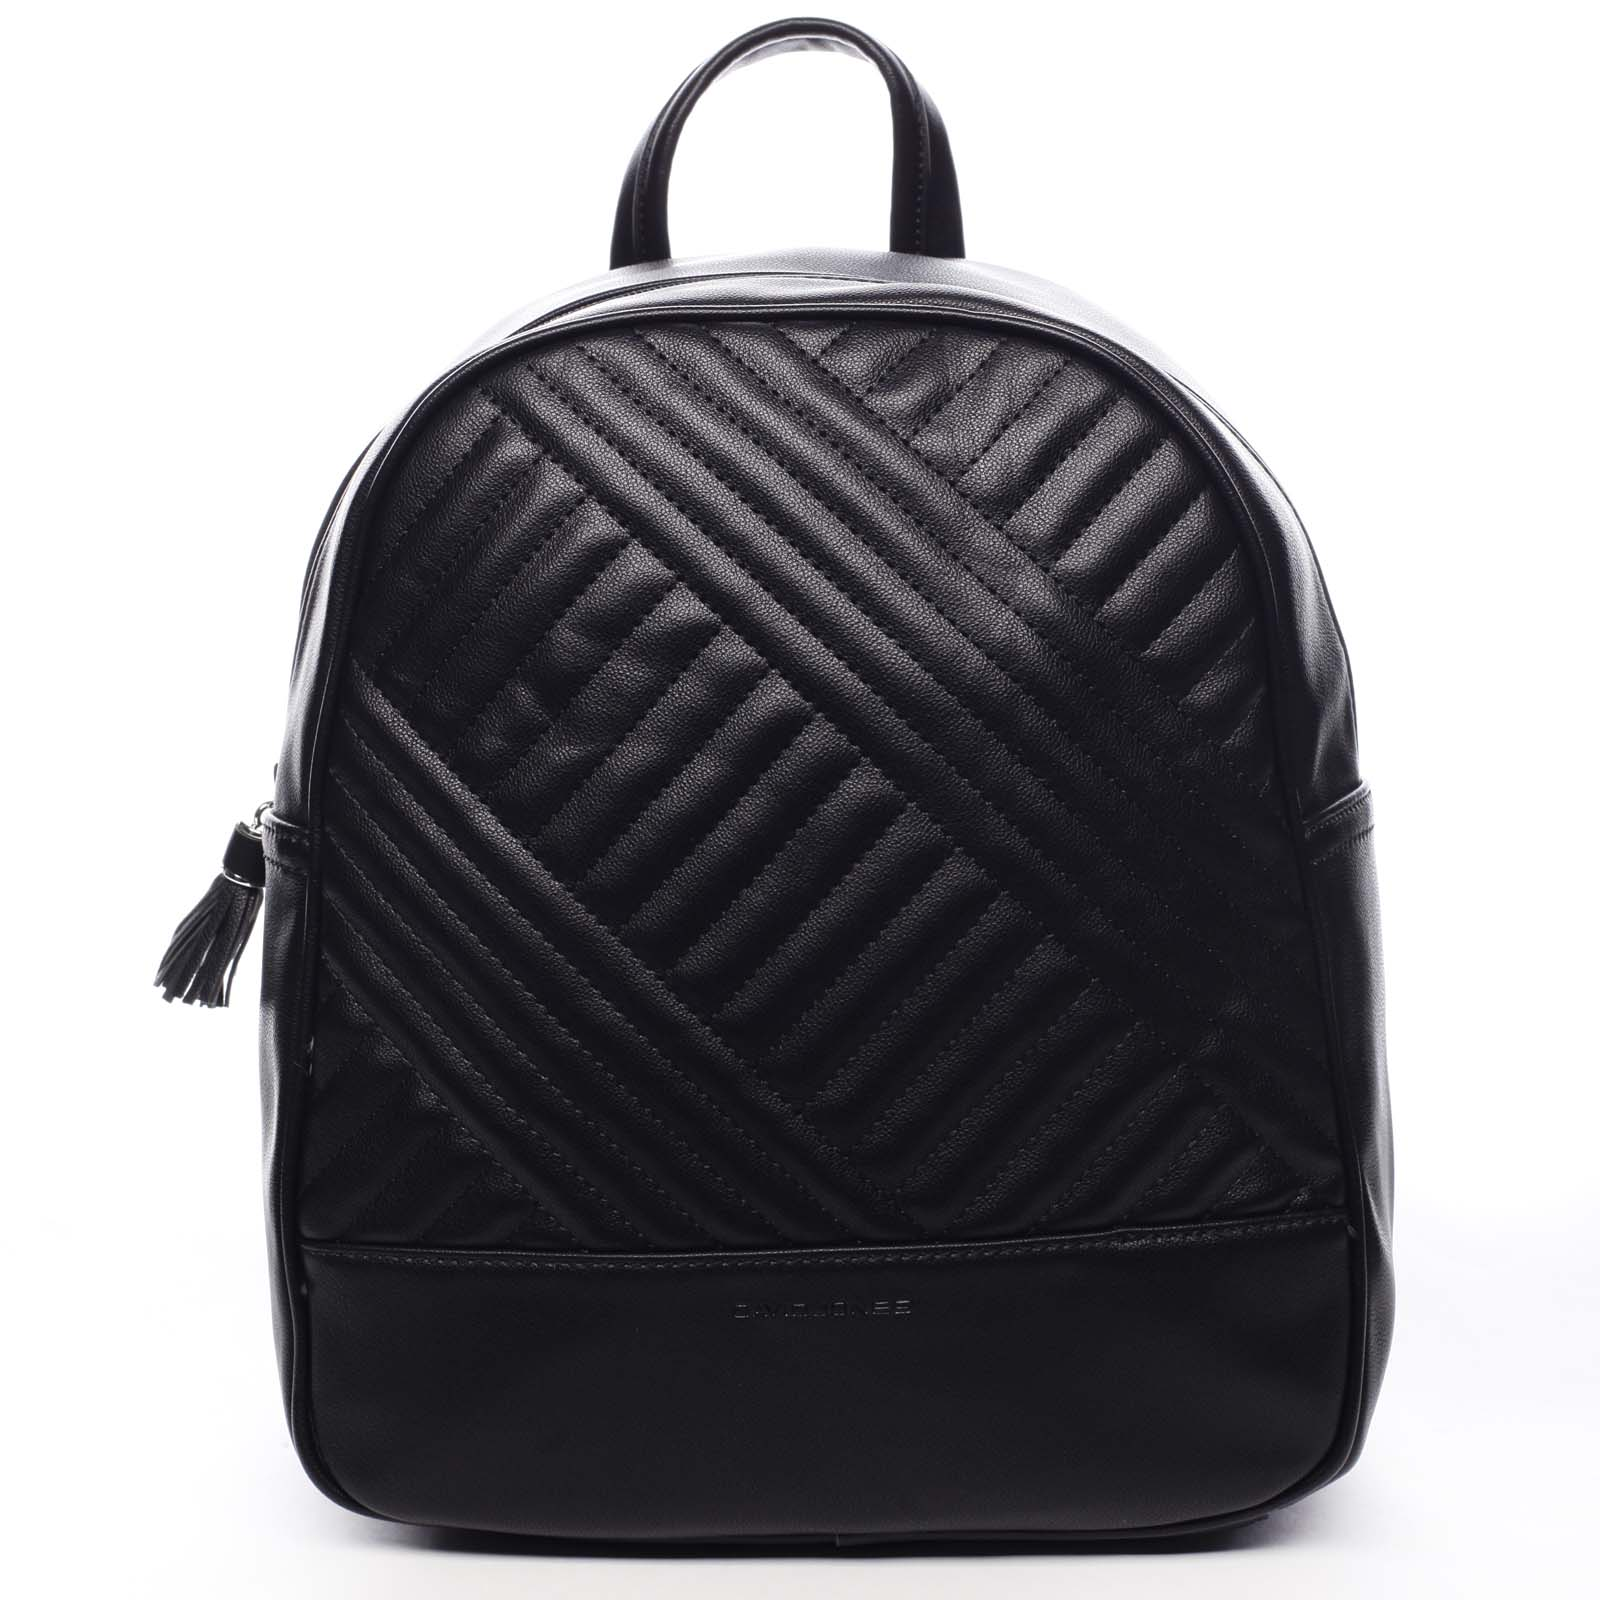 Dámsky batoh čierny - David Jones Pereira